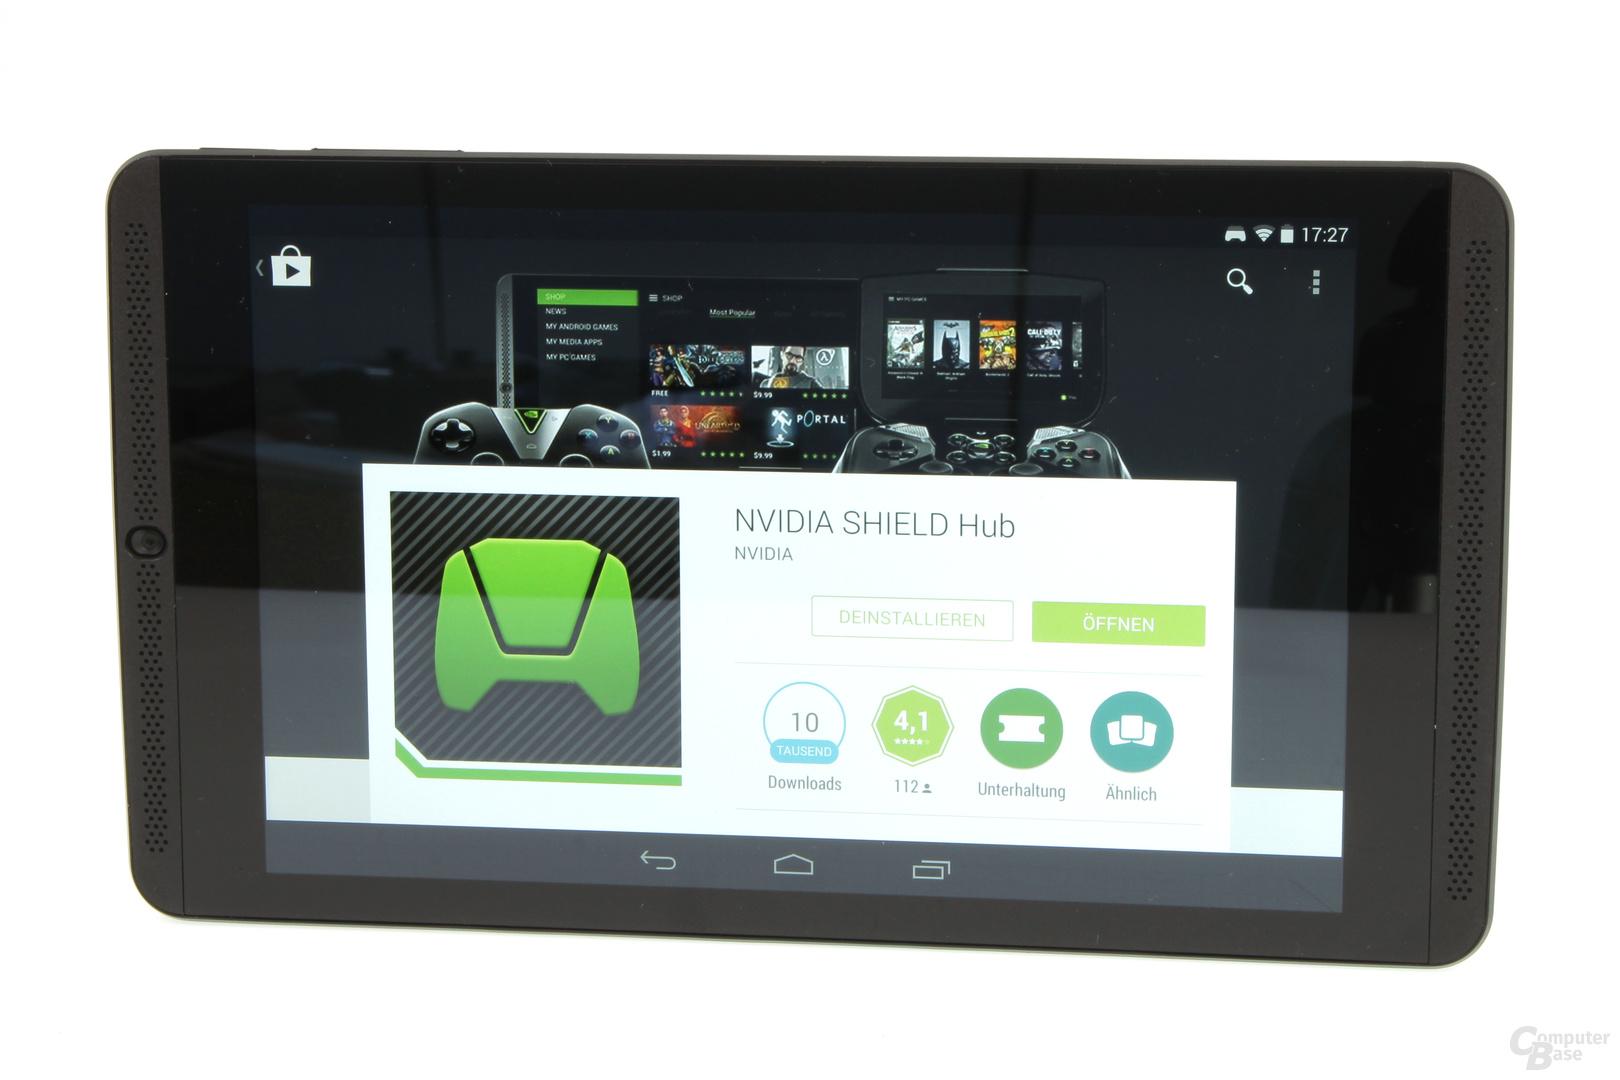 Nvidia Shield Tablet - angeschaltetes Display